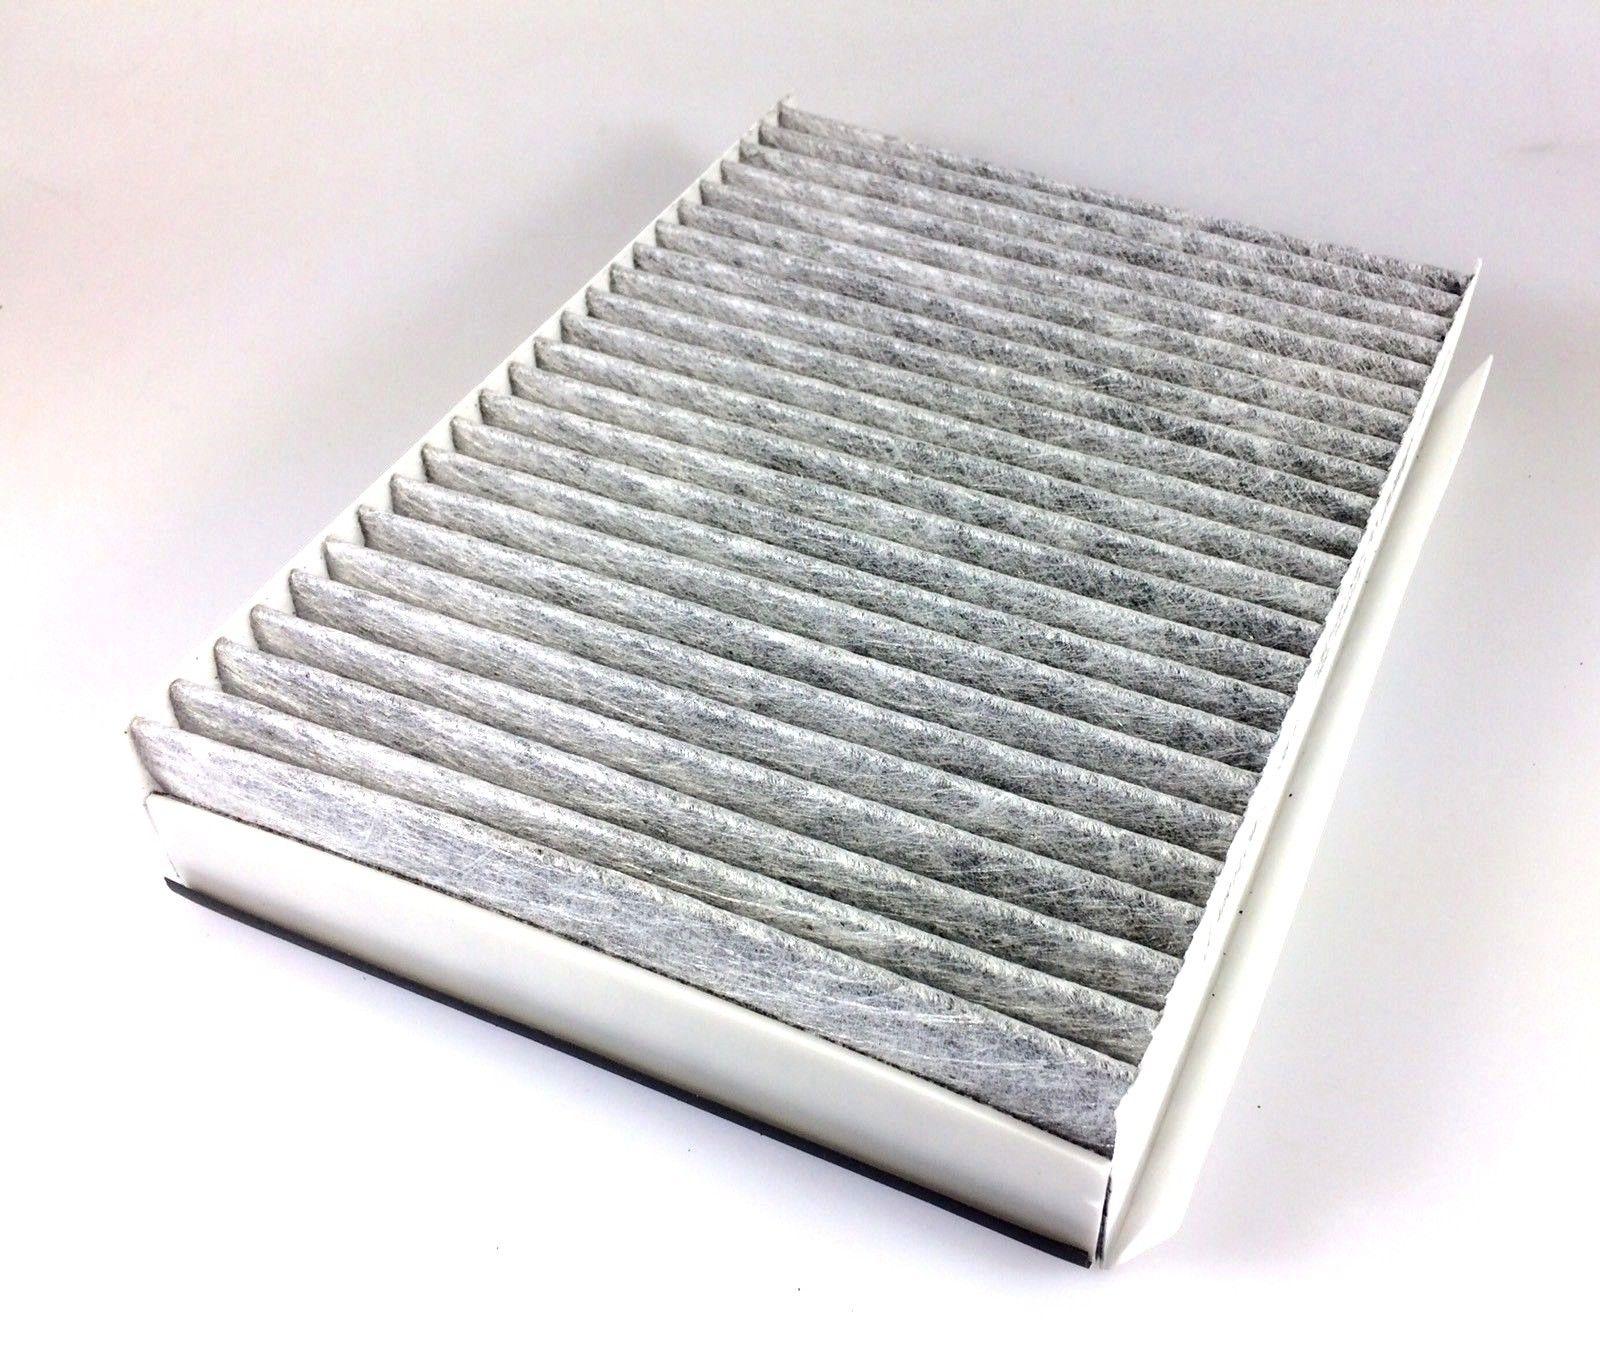 JAGUAR S-TYPE (LATE MODELS) CABIN POLLEN FILTER – XR849205.